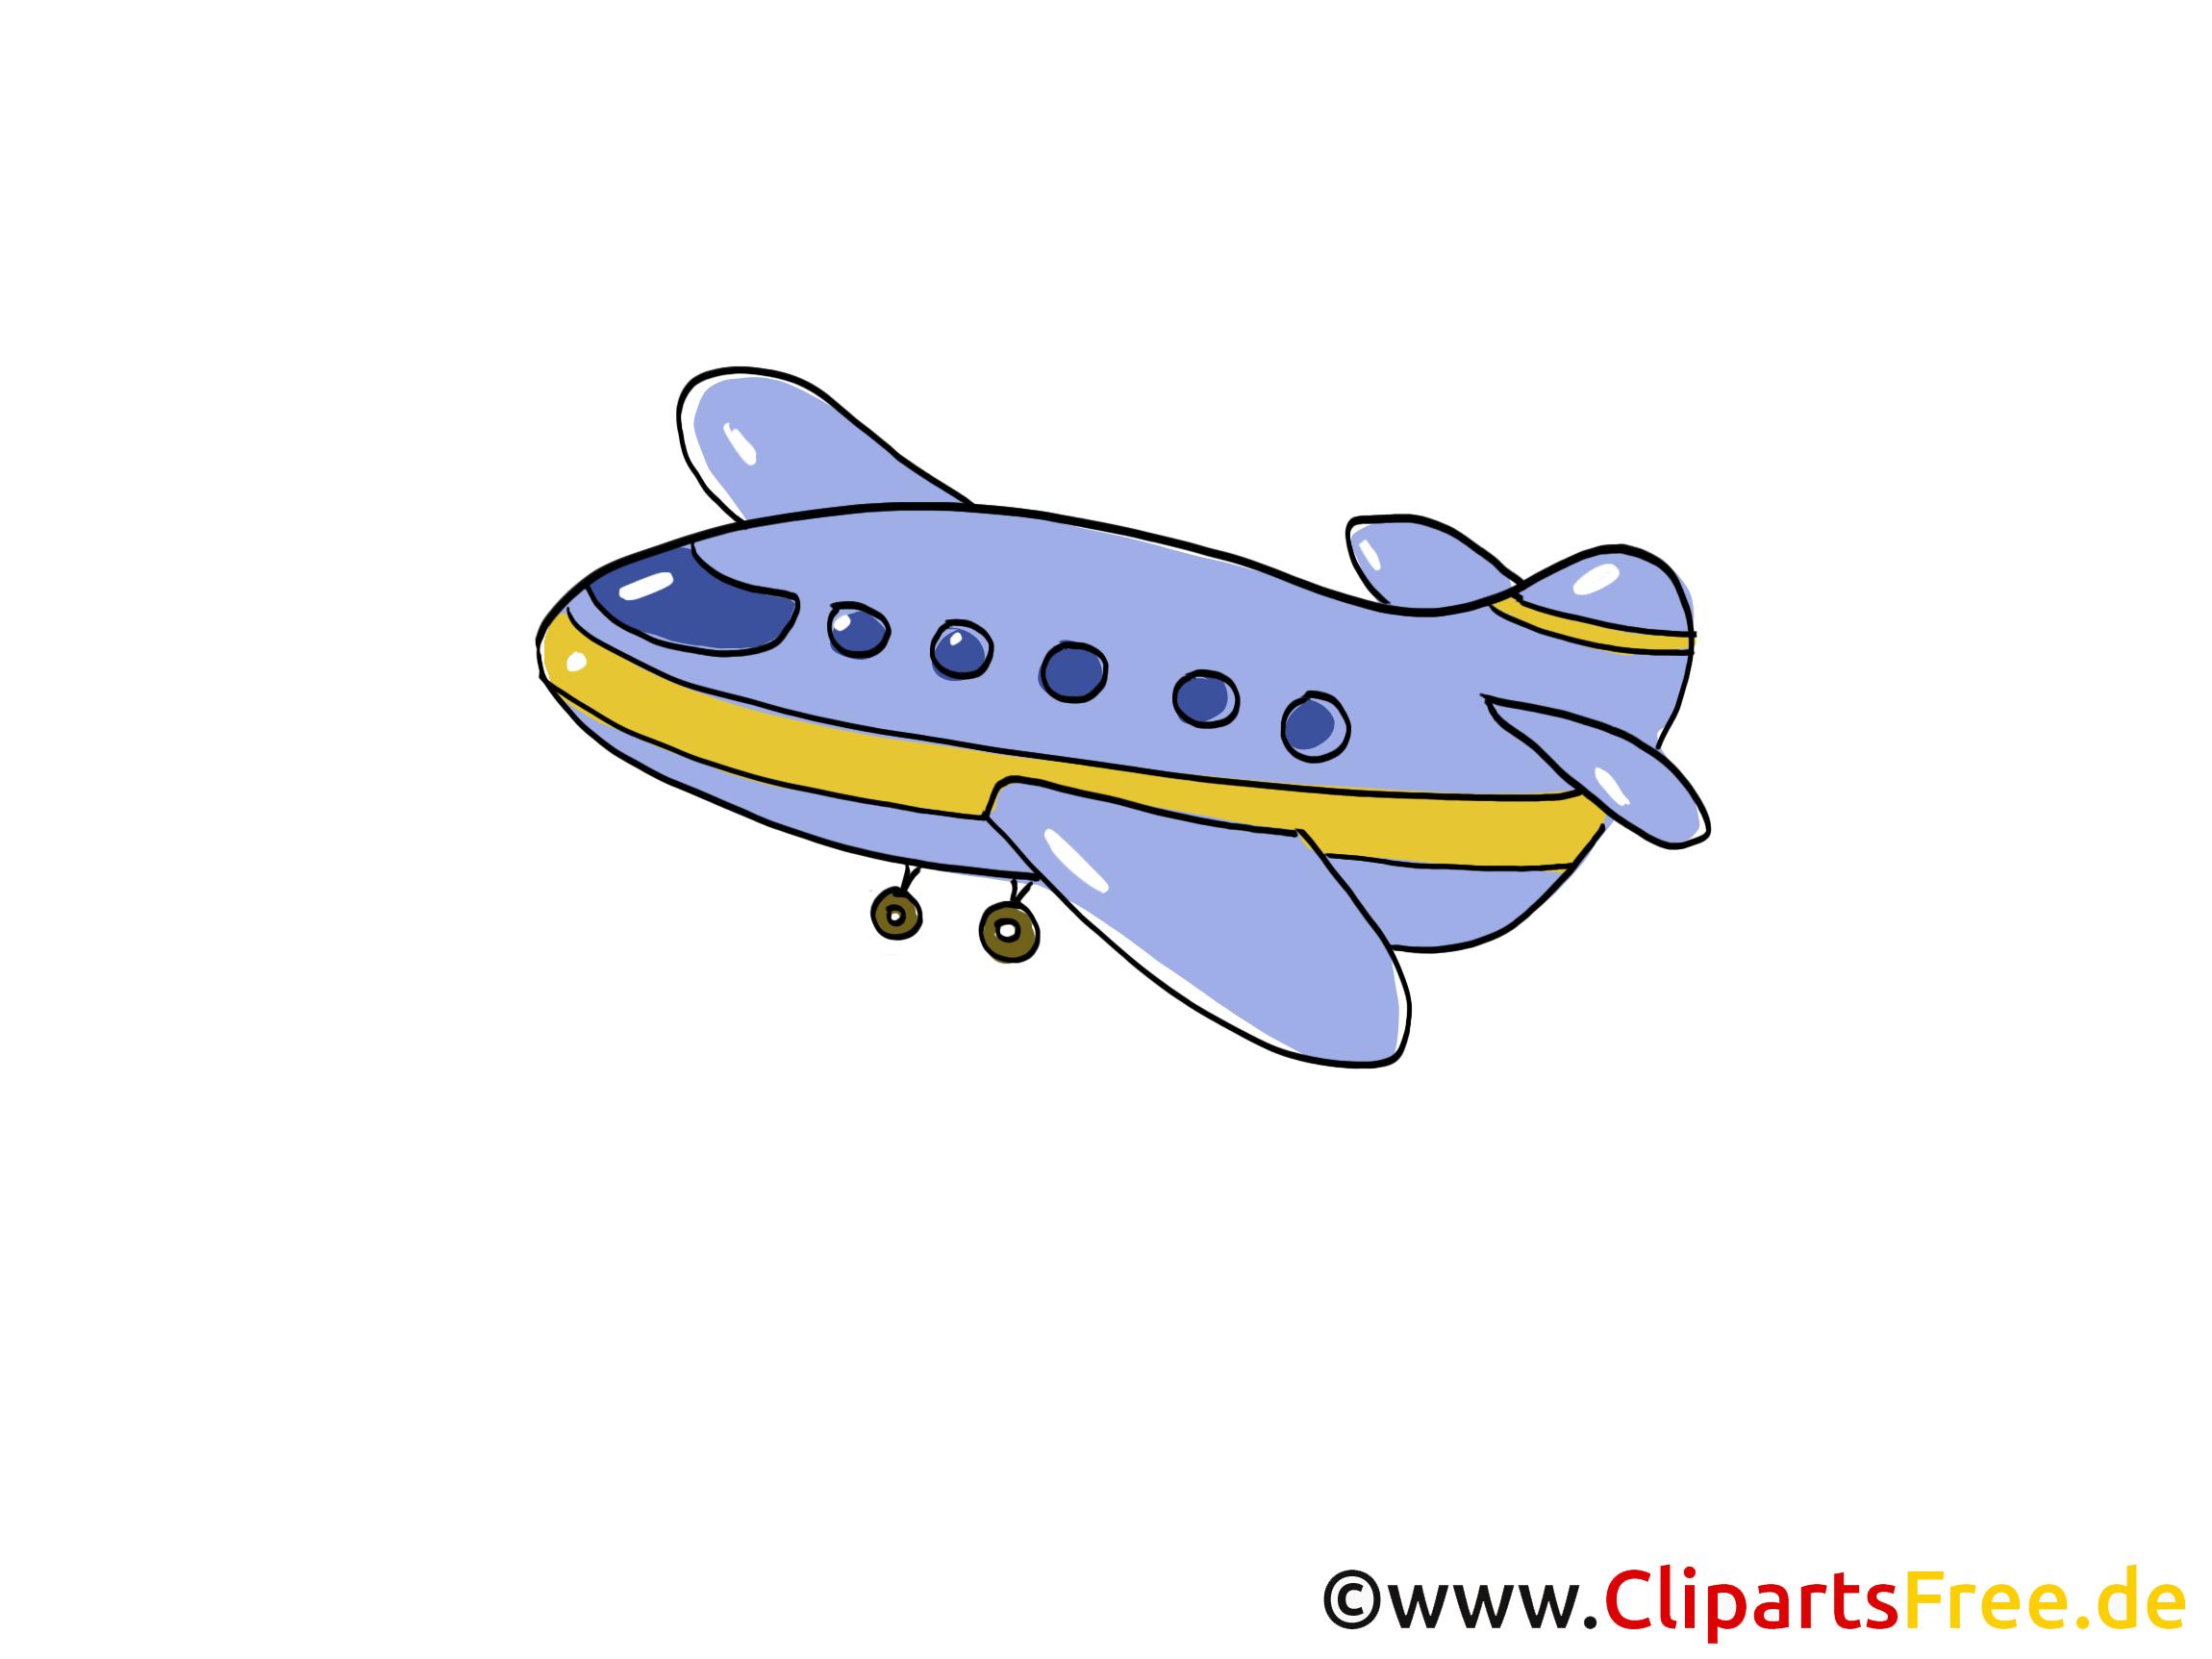 flugzeug comic